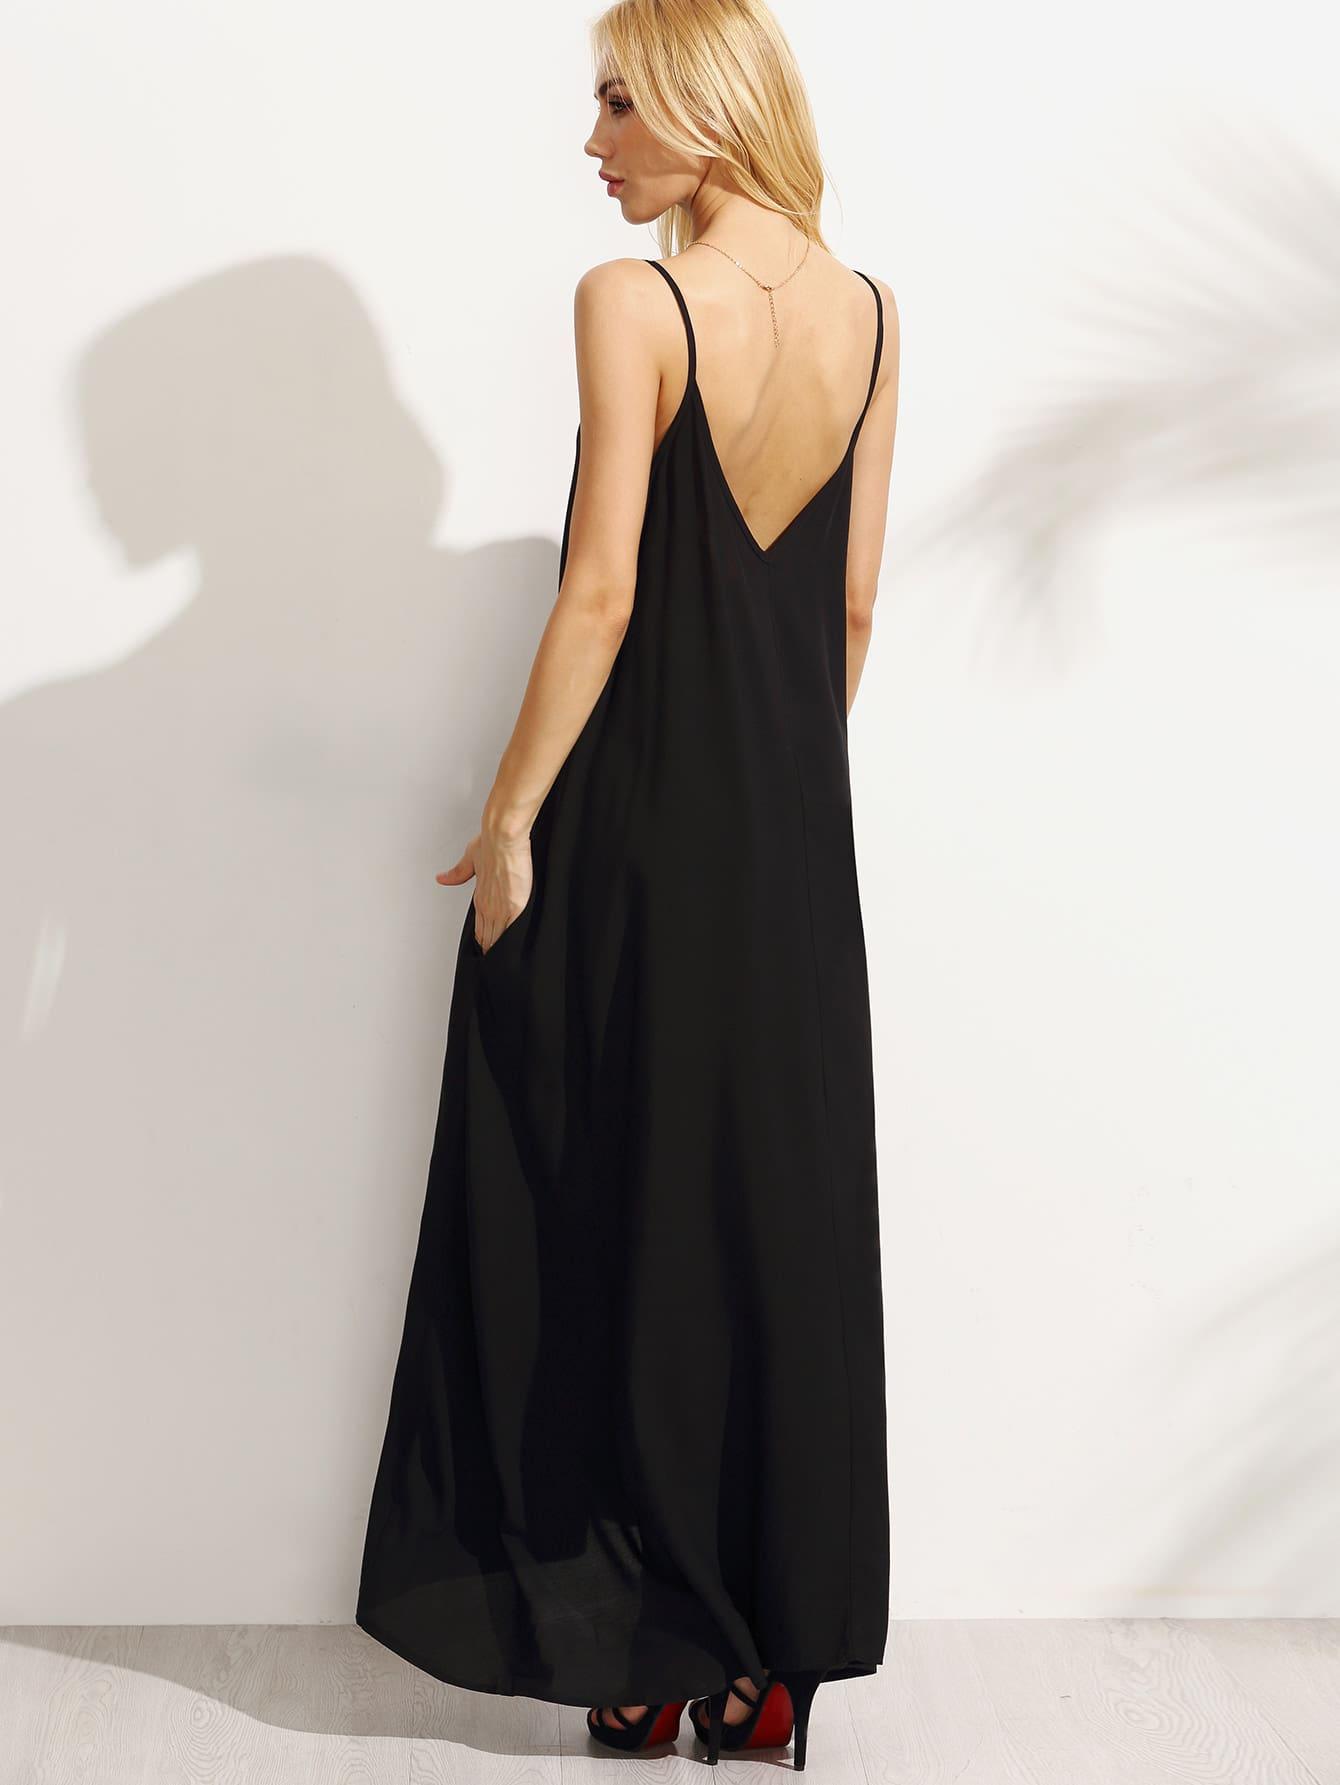 robe longue bretelle noir french shein sheinside. Black Bedroom Furniture Sets. Home Design Ideas